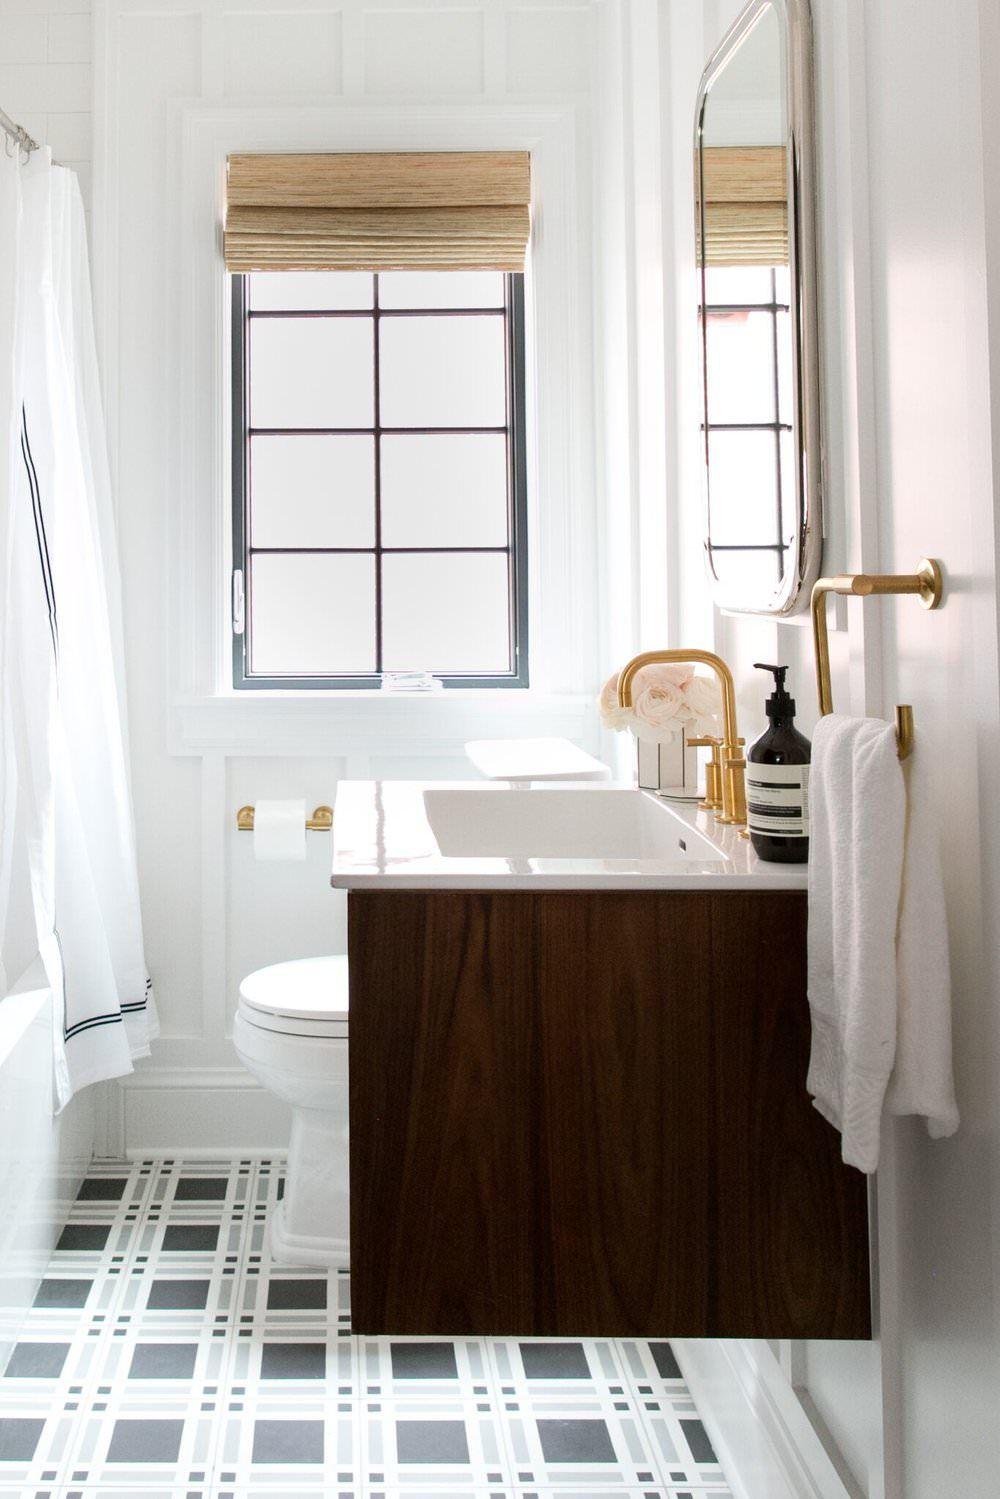 2018 Design Trends for the Bathroom   Pinterest   Floating vanity ...